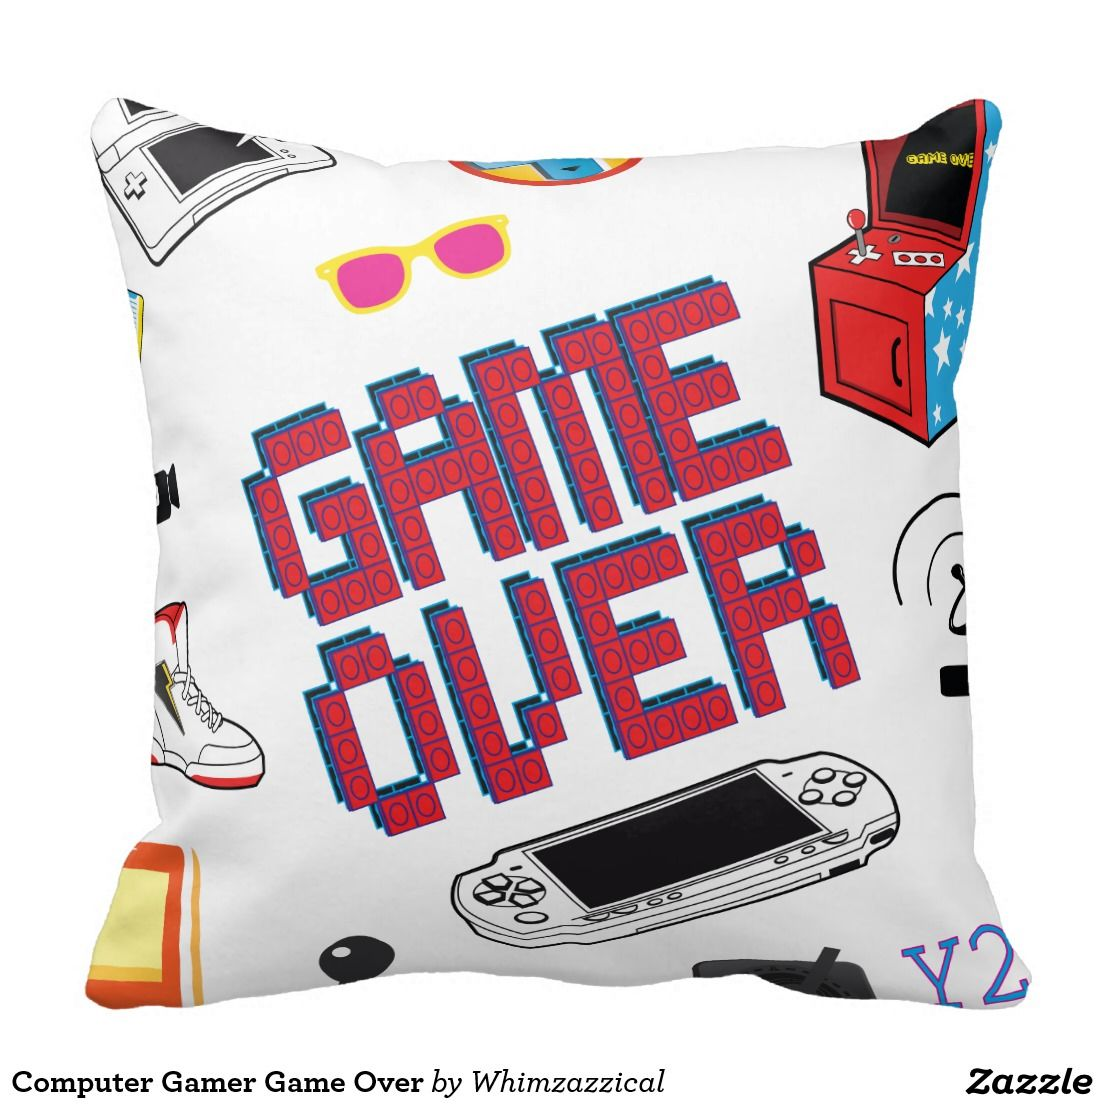 b267e93f0 Computer Gamer Game Over Throw Pillow